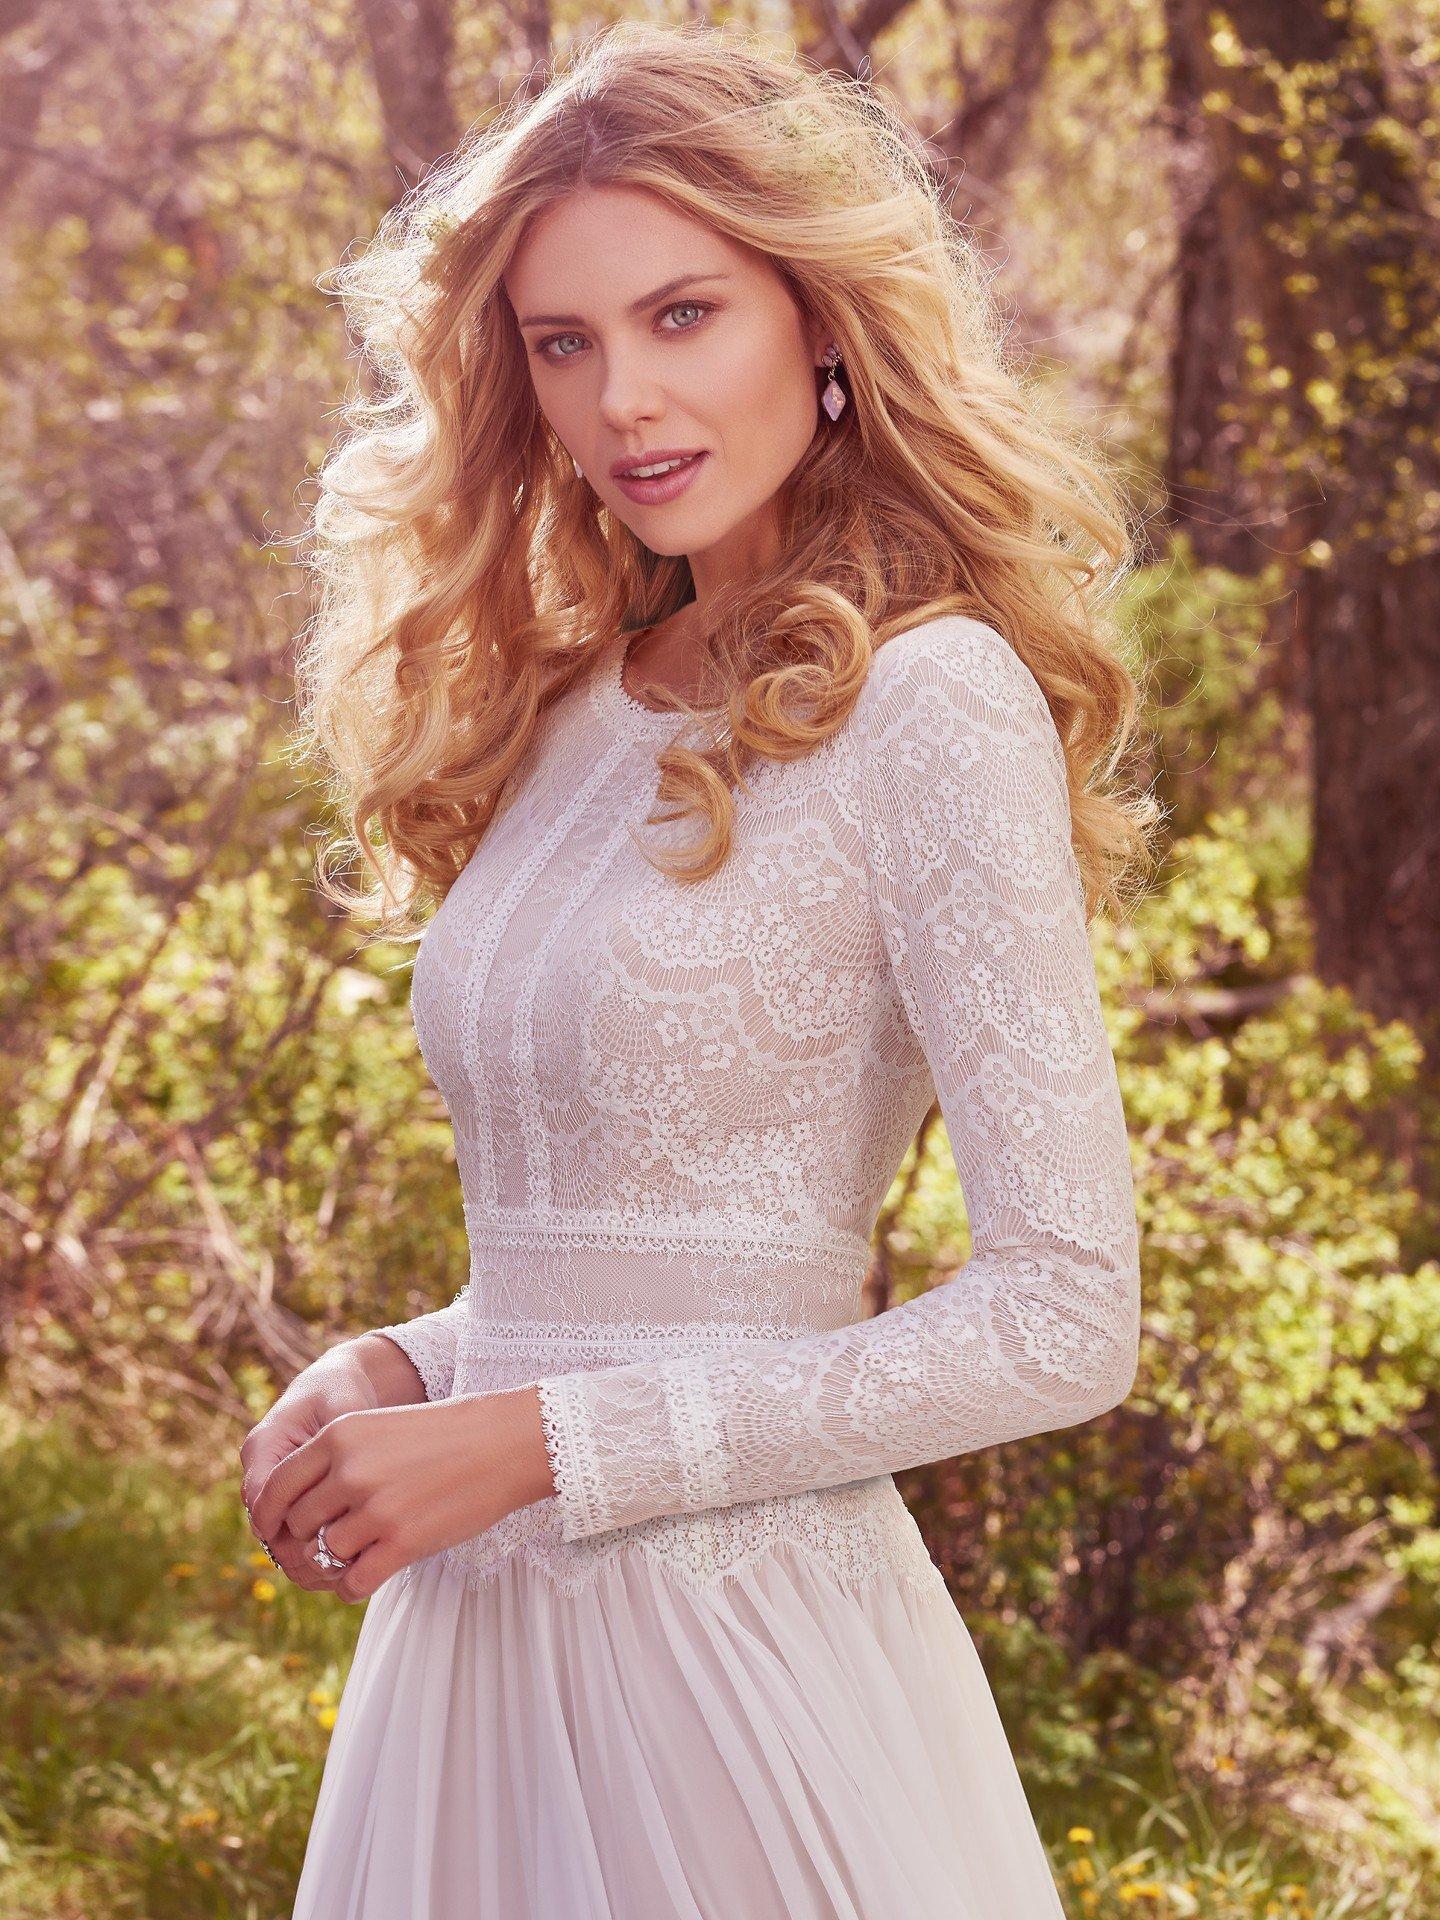 Maggie-Sottero-Wedding-Dress-Deirdre-Mar